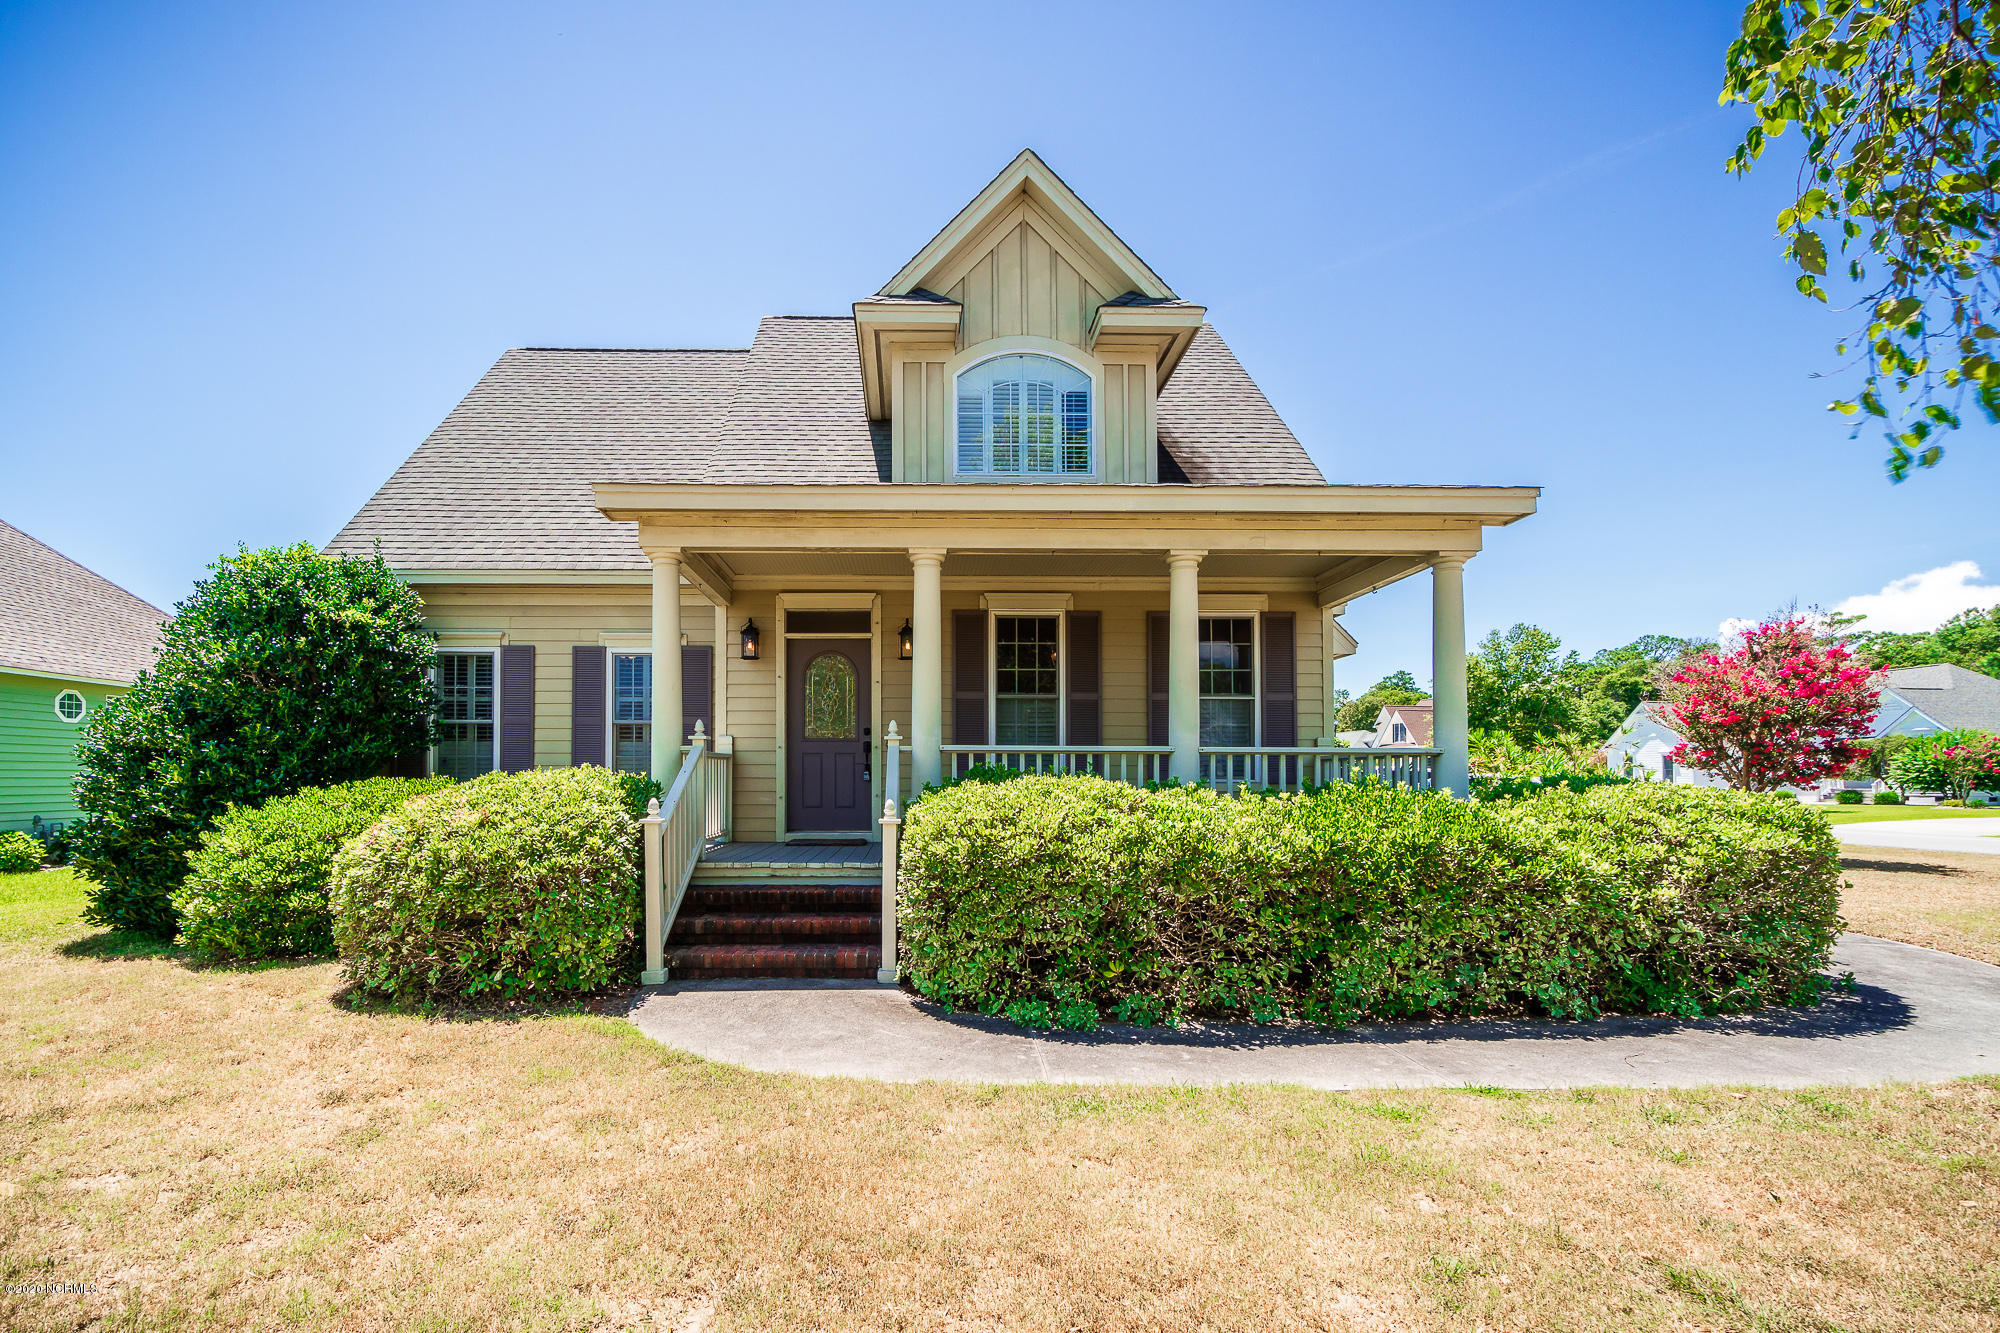 103 Magens Way, Cedar Point, North Carolina 28584, 4 Bedrooms Bedrooms, ,3 BathroomsBathrooms,Residential,For Sale,Magens,100210687